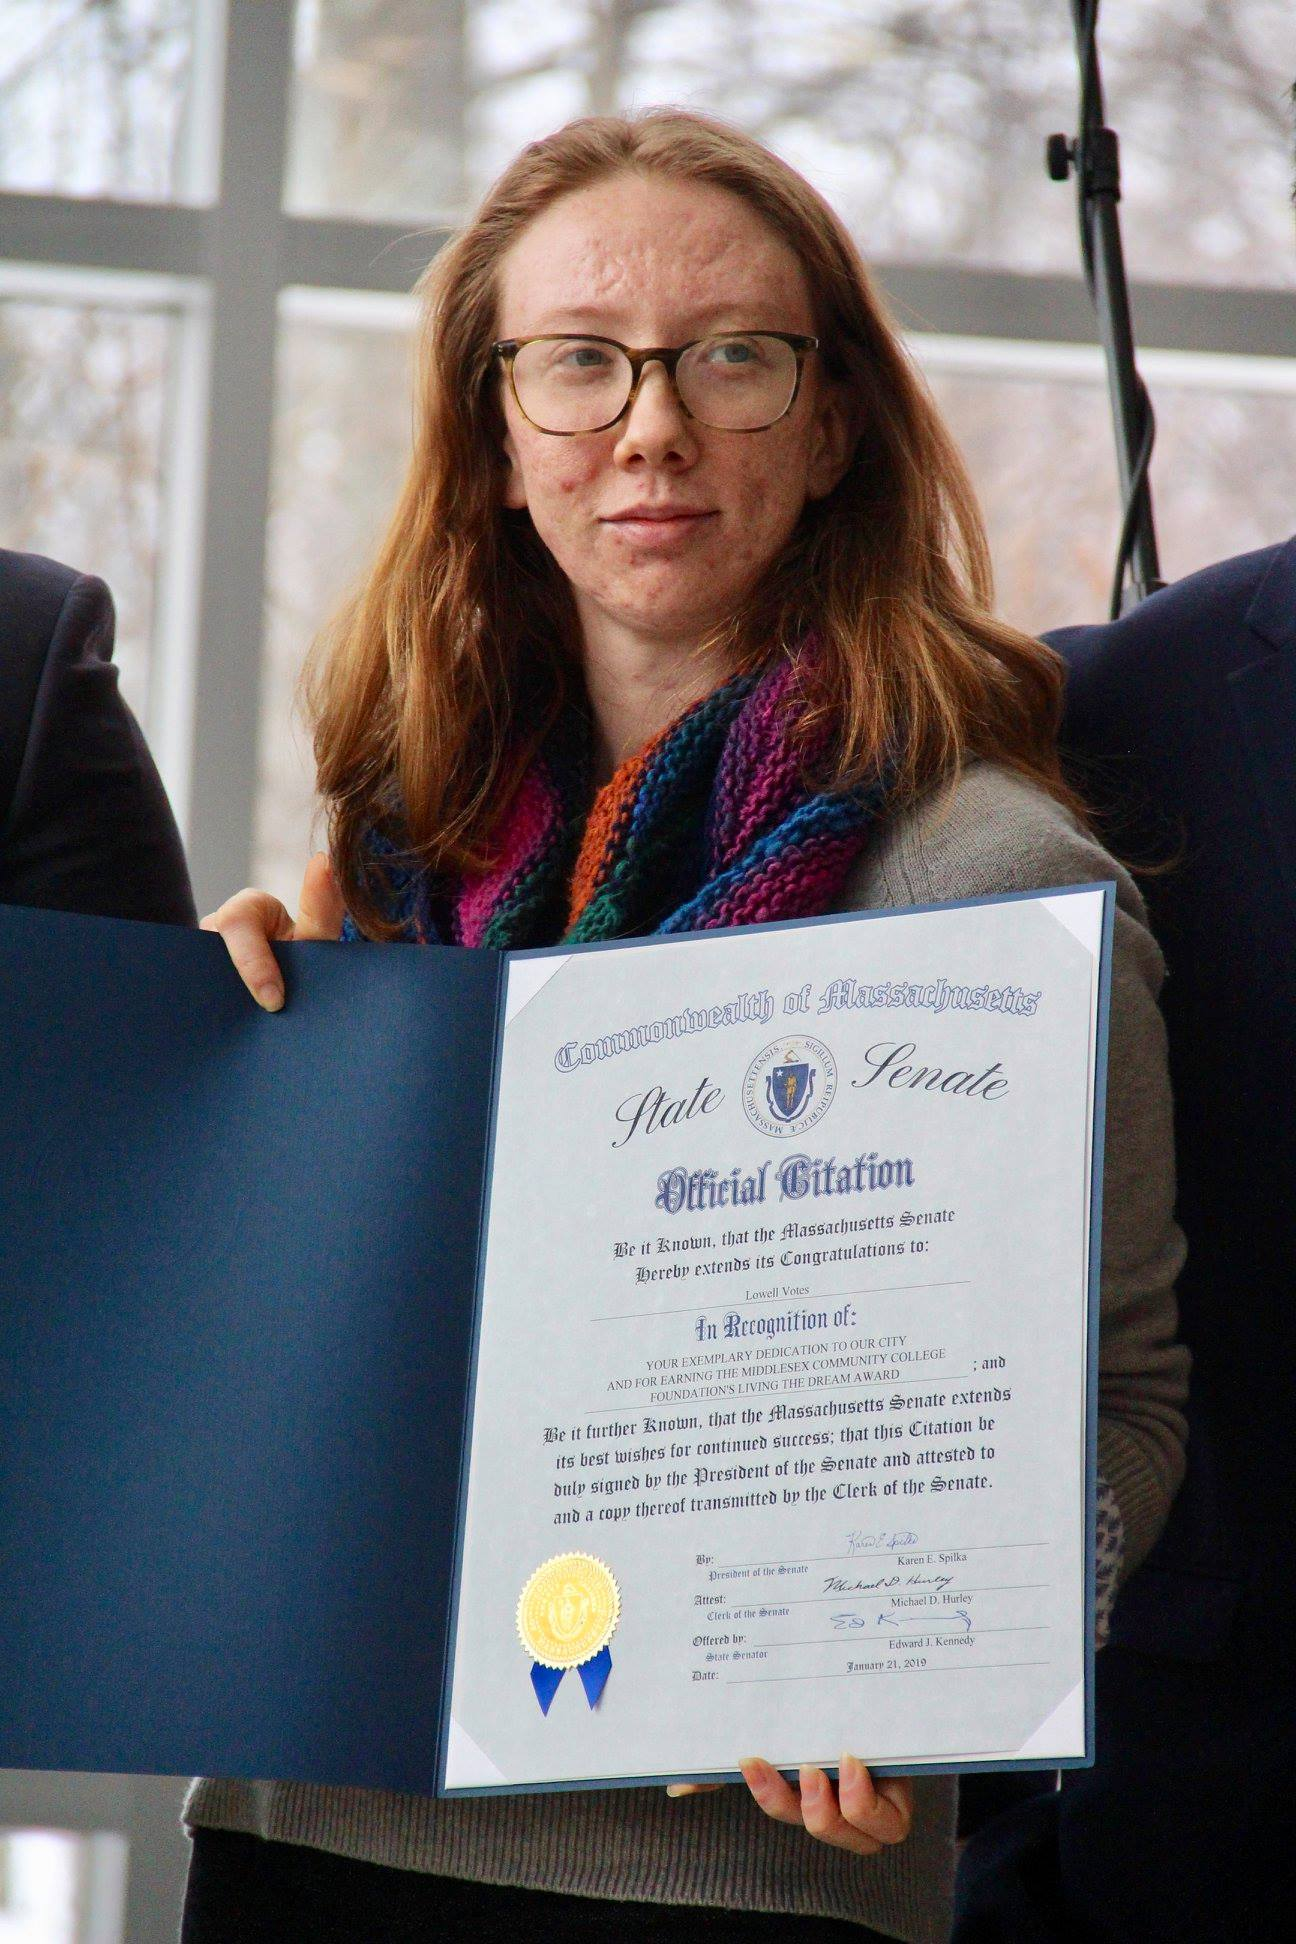 Mary accepting an award